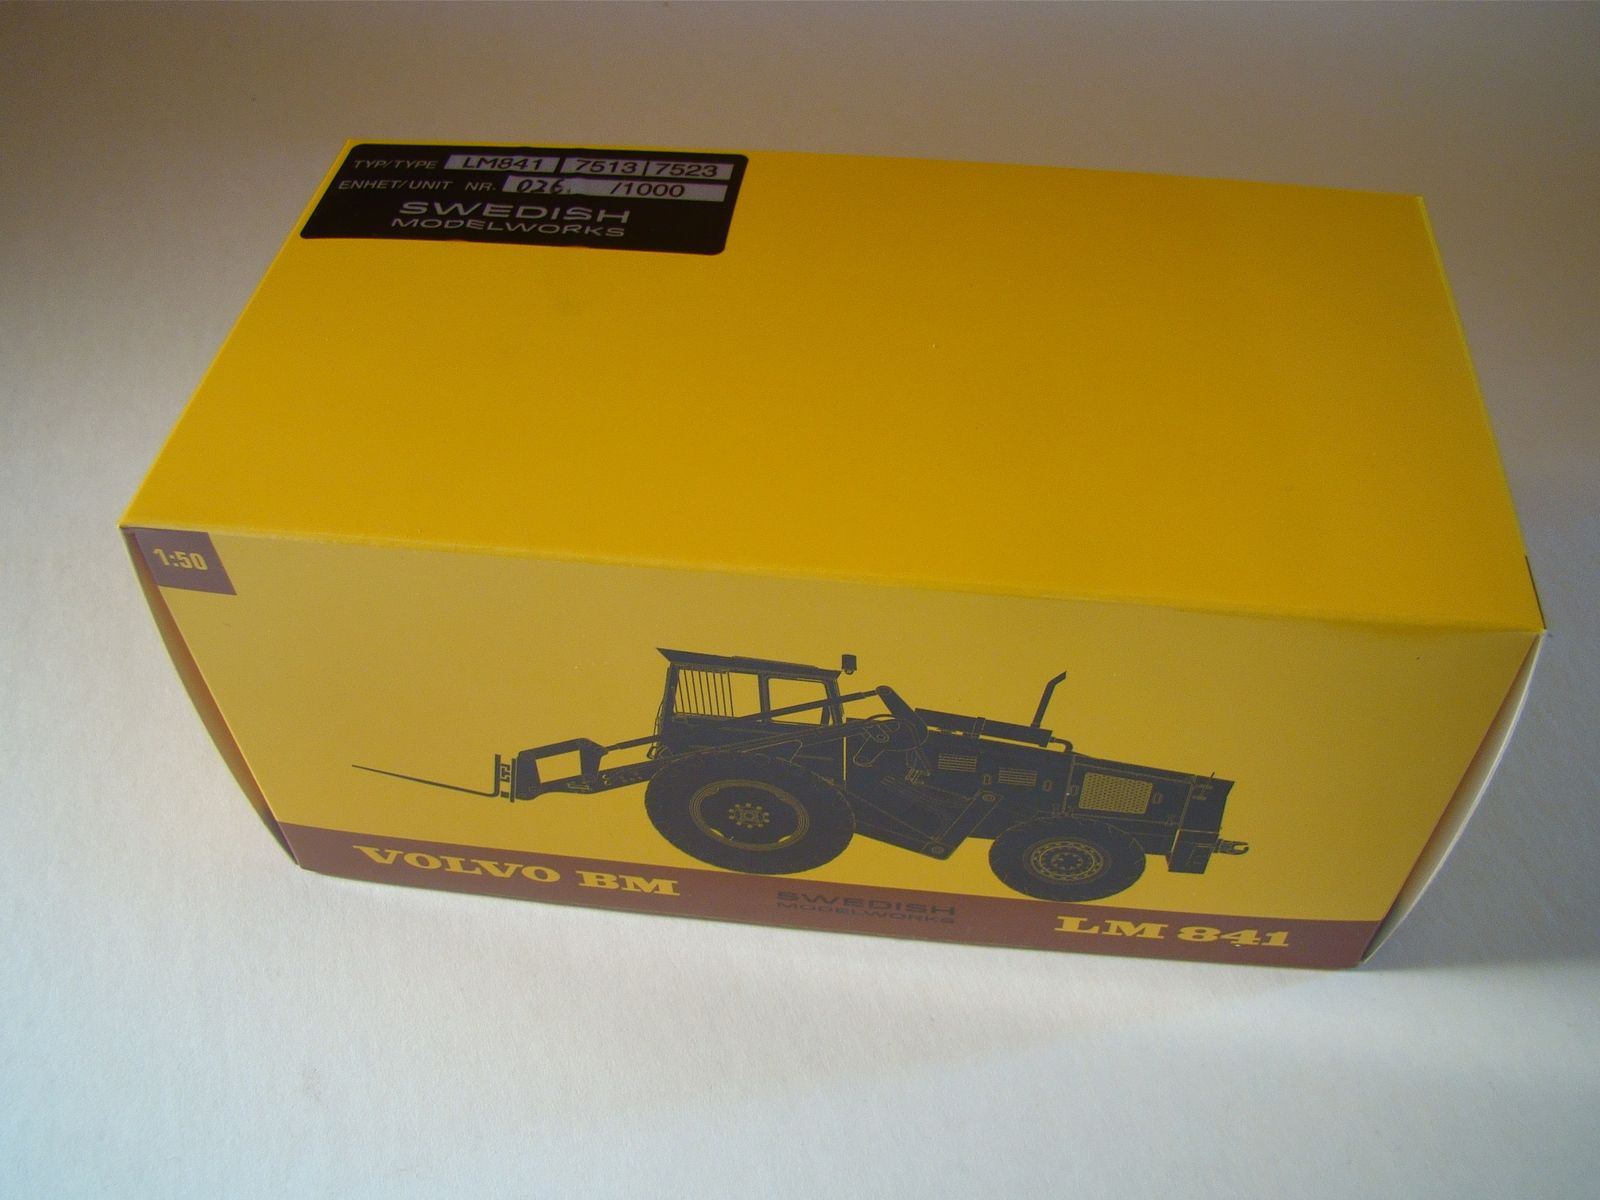 Volvo LM841, 1/50